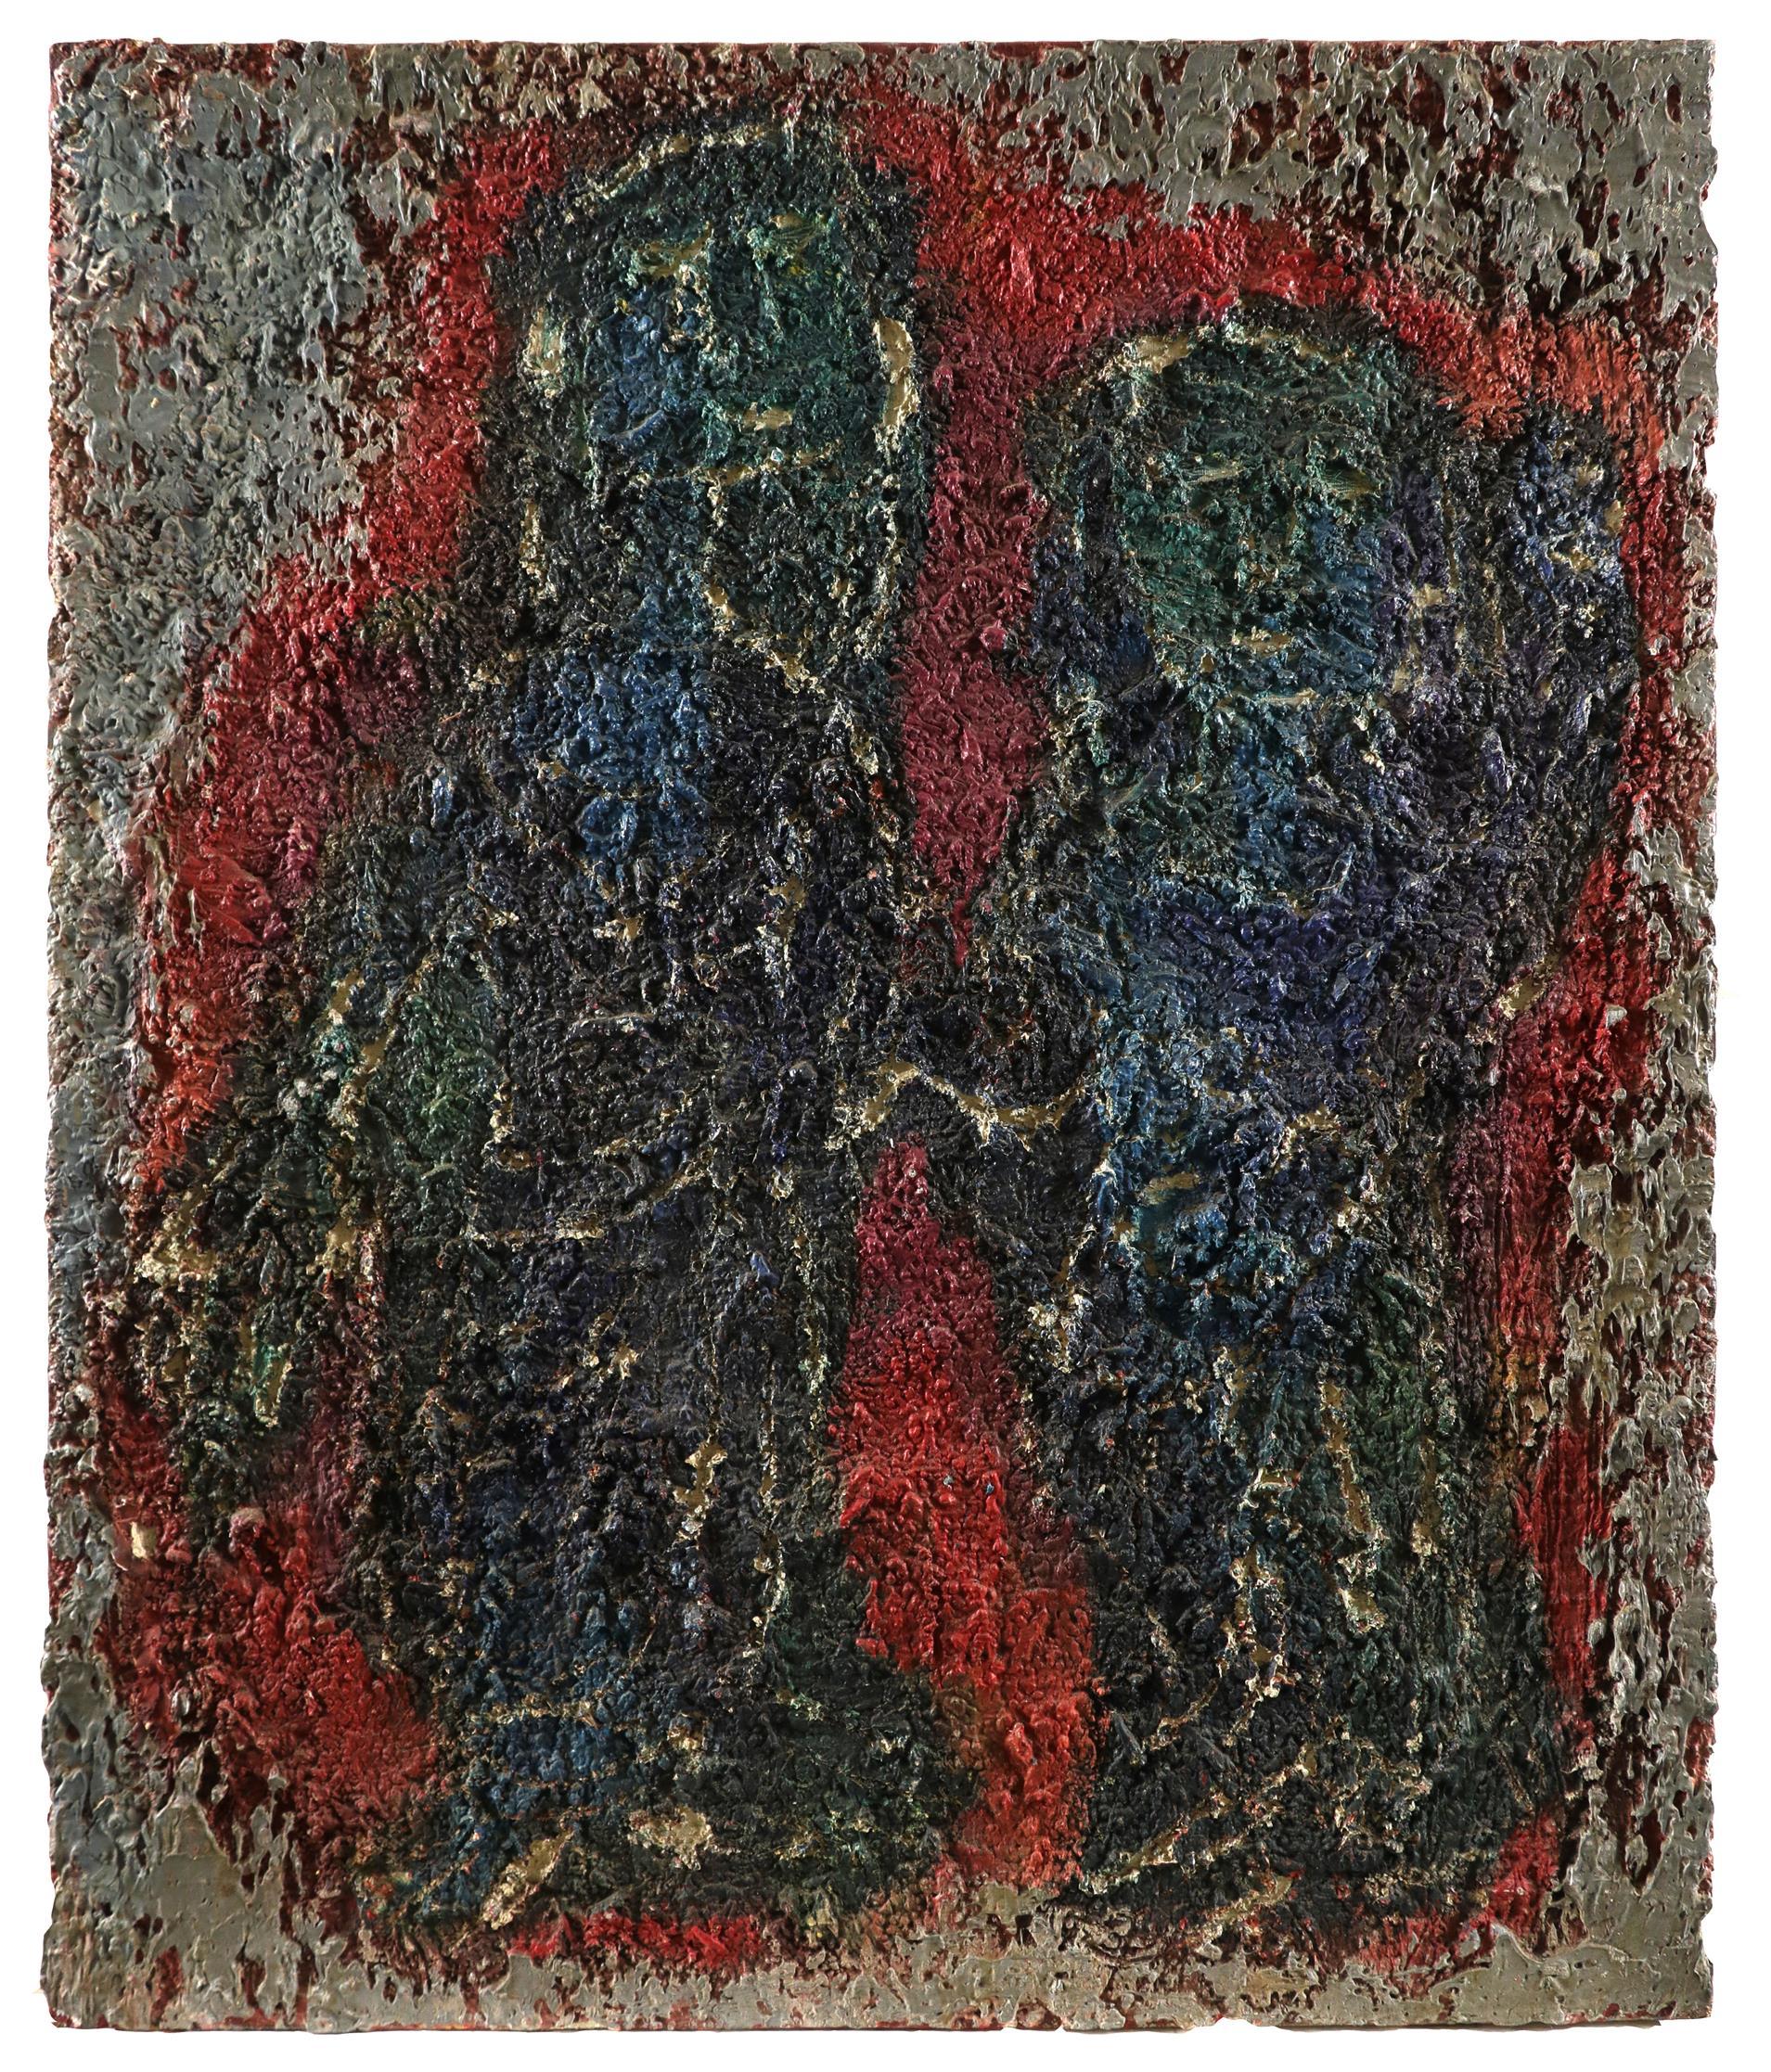 ‡Nina Hosali (1898-1987) Floating Forms; Encounter I; Two figures Three, one signed and dated Hosali - Image 8 of 9